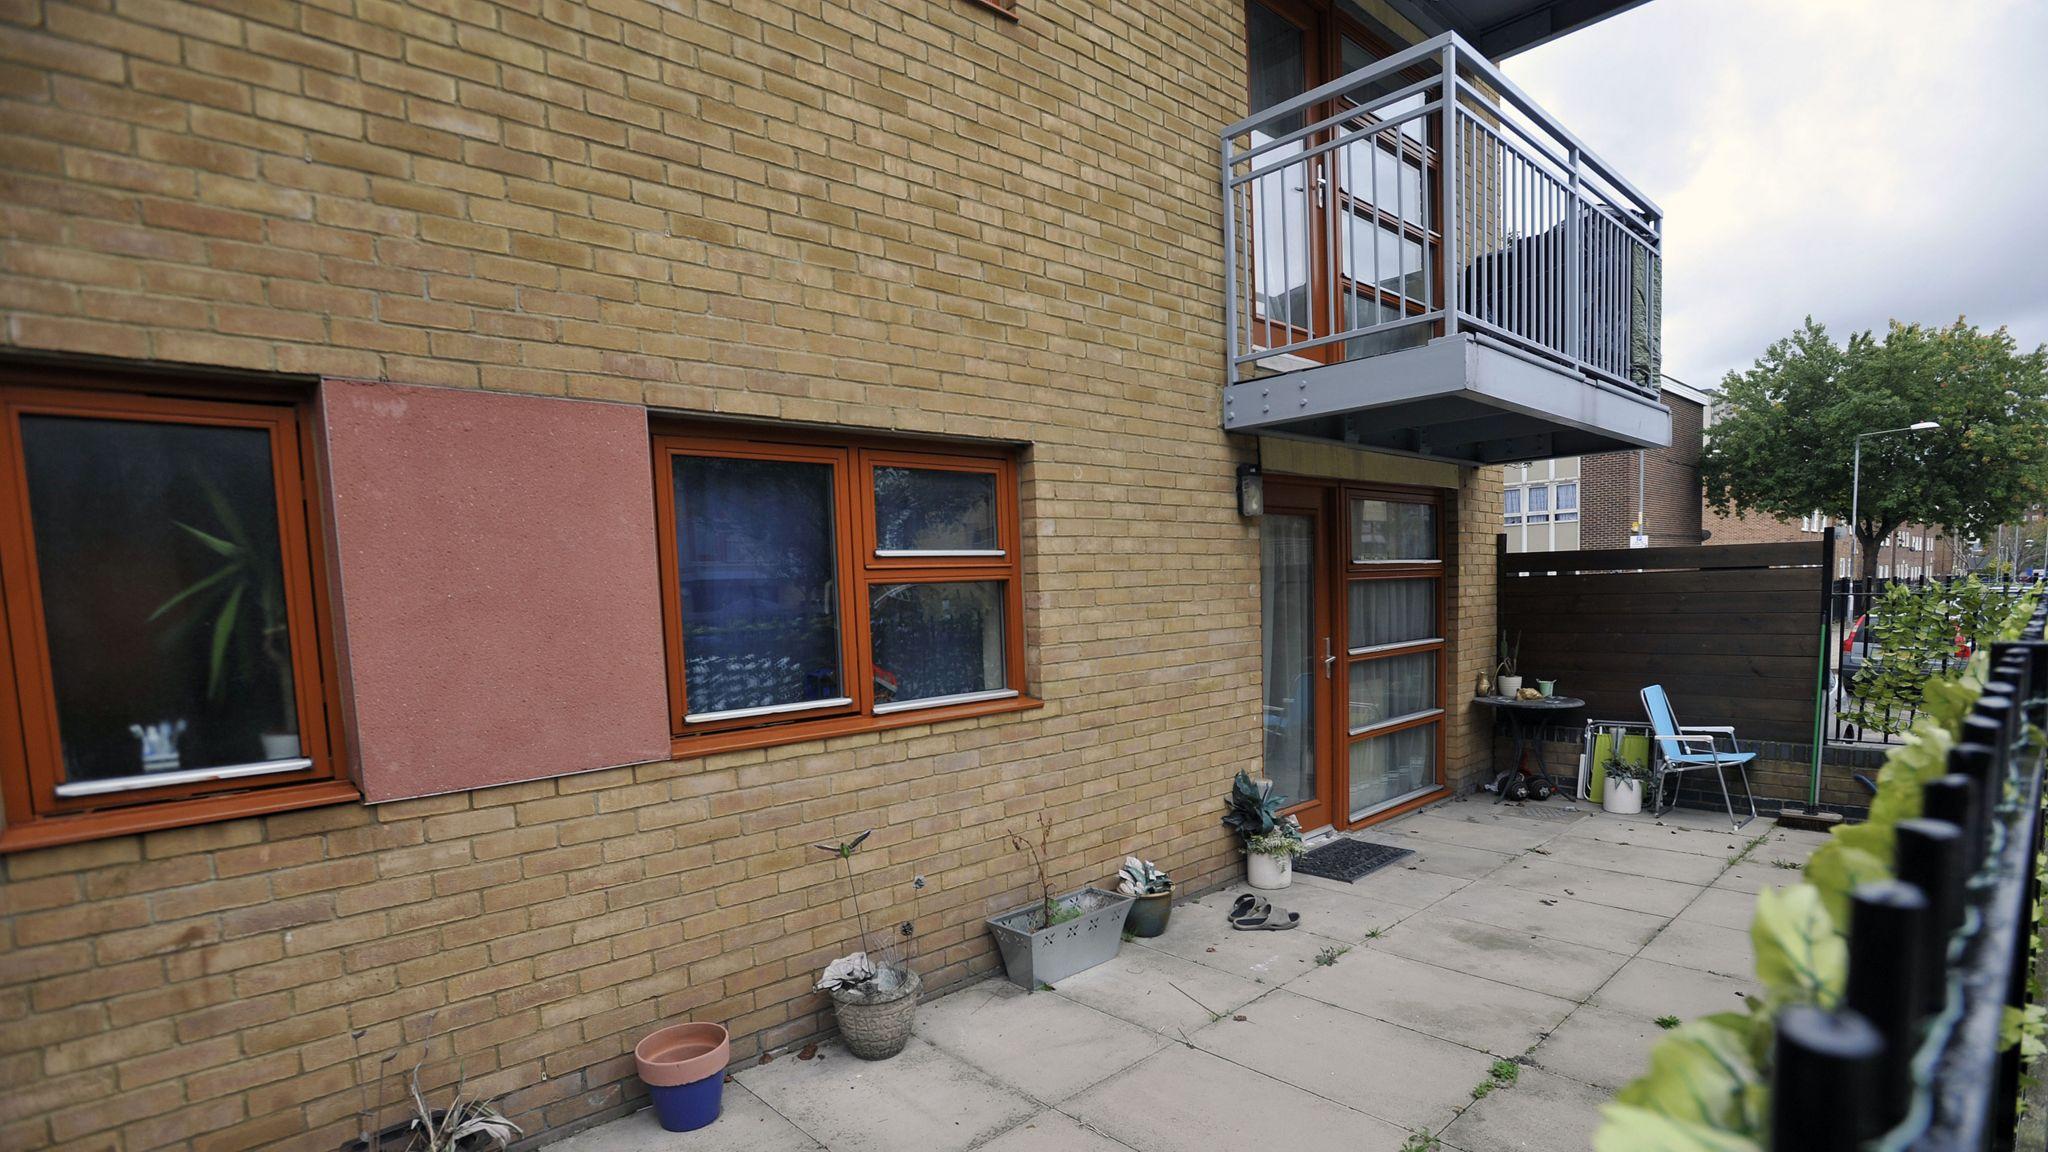 Stephen Port's flat in Barking